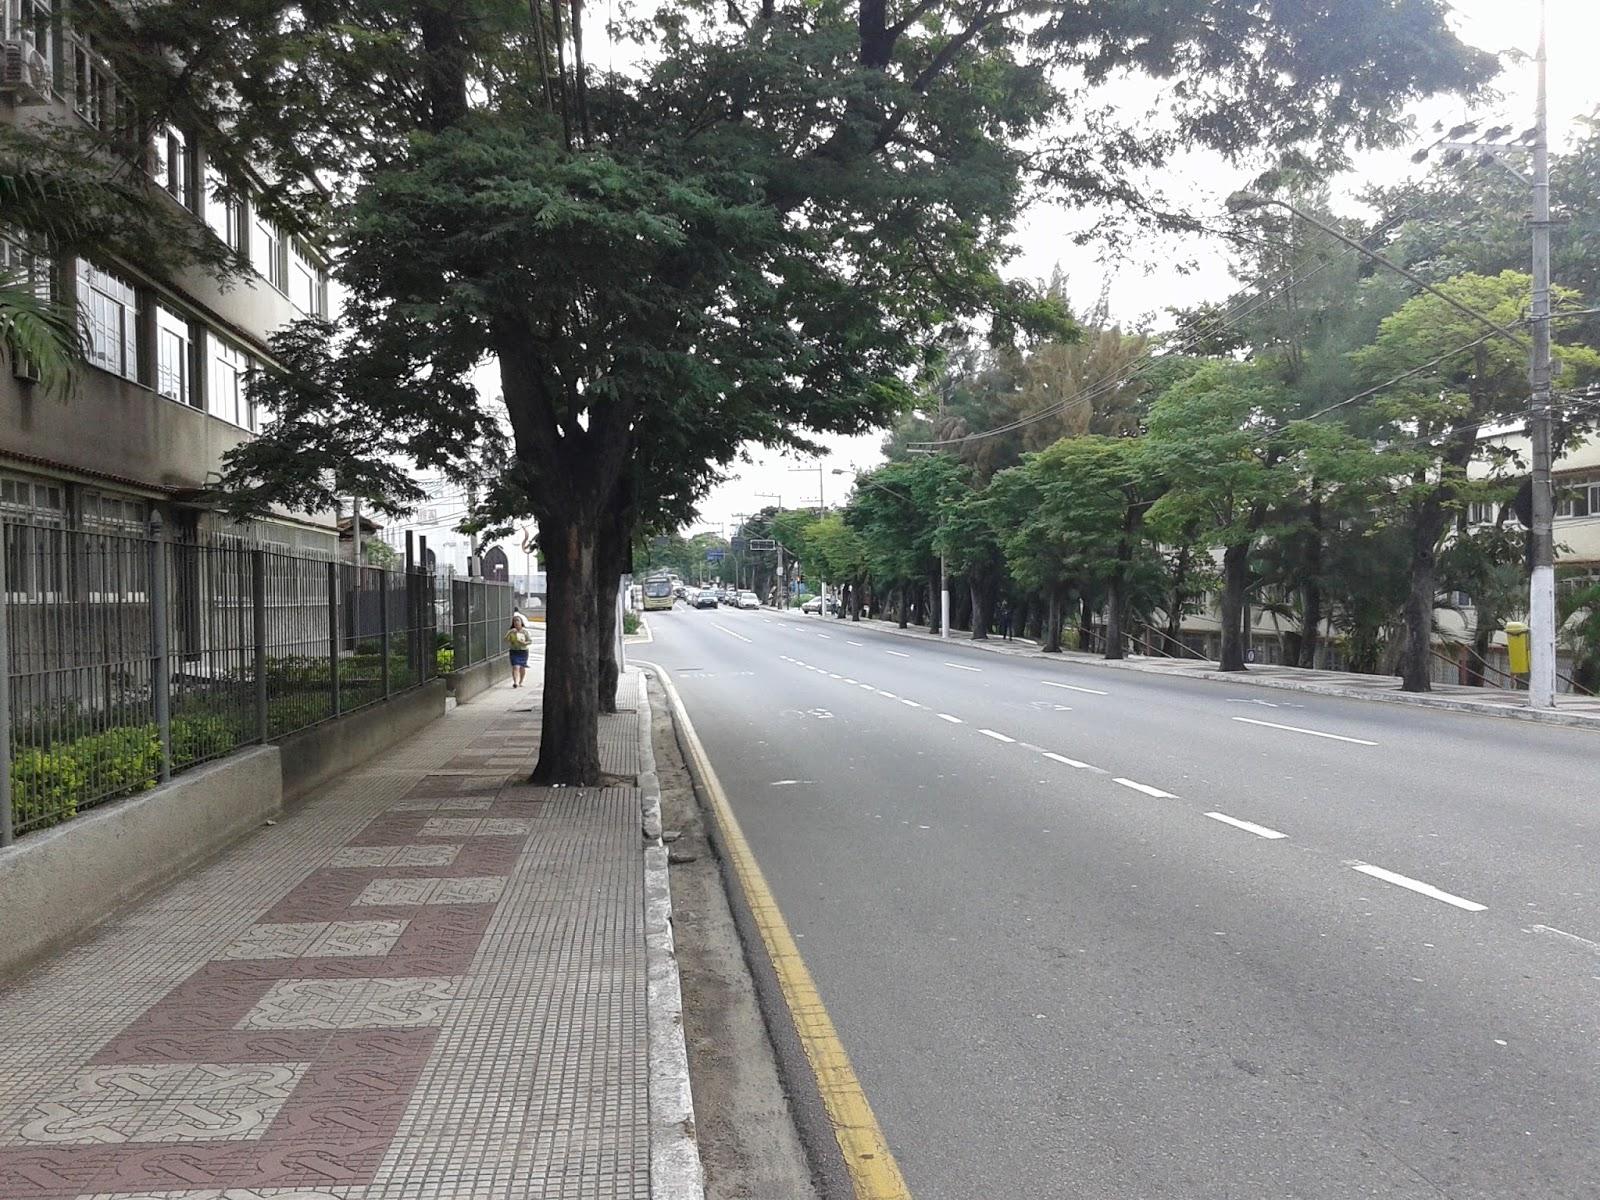 Avenida Dr. Nelson dos Santos Gonçalves